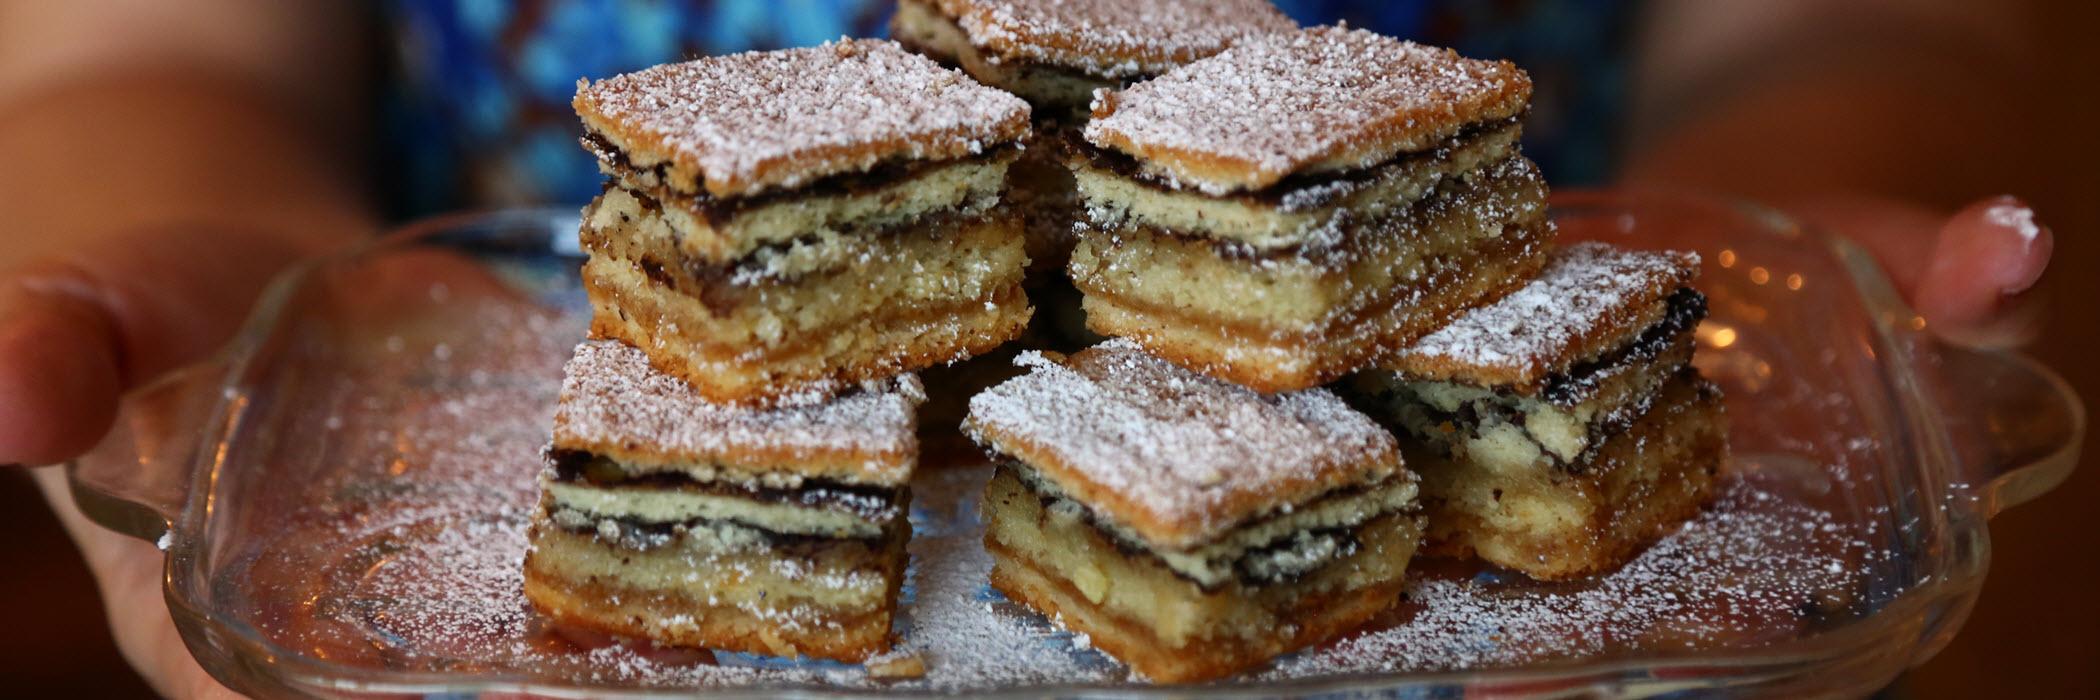 schmaltzy_german_cake.jpg